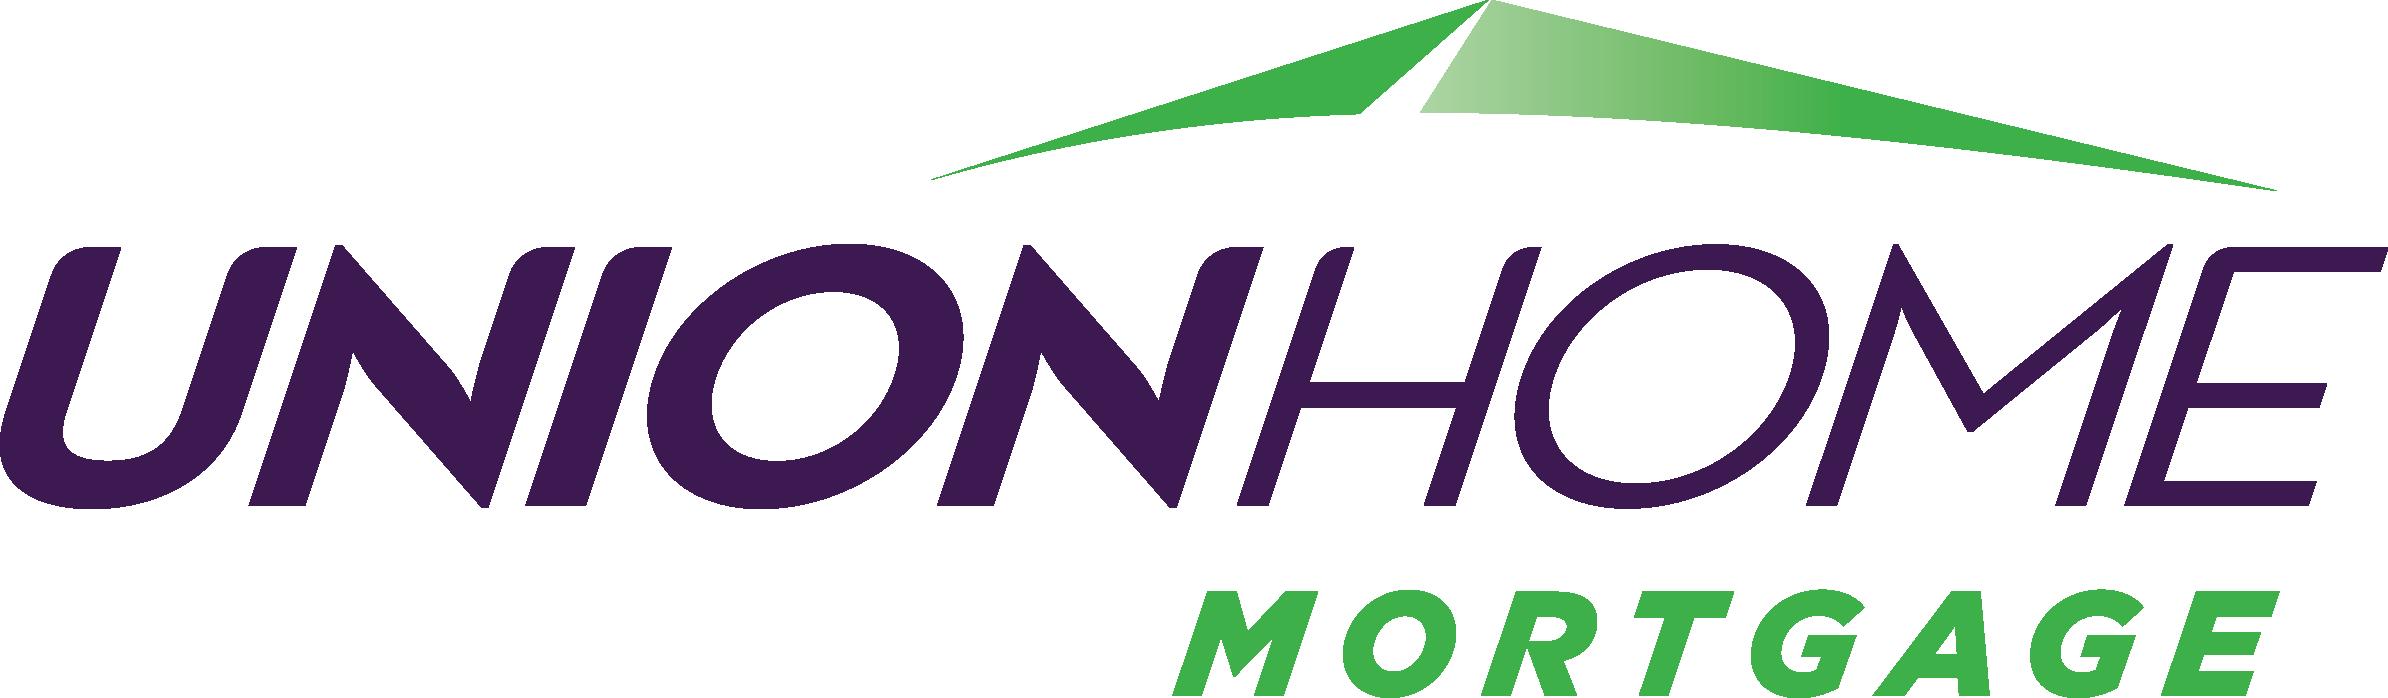 uhm_logo (1).png